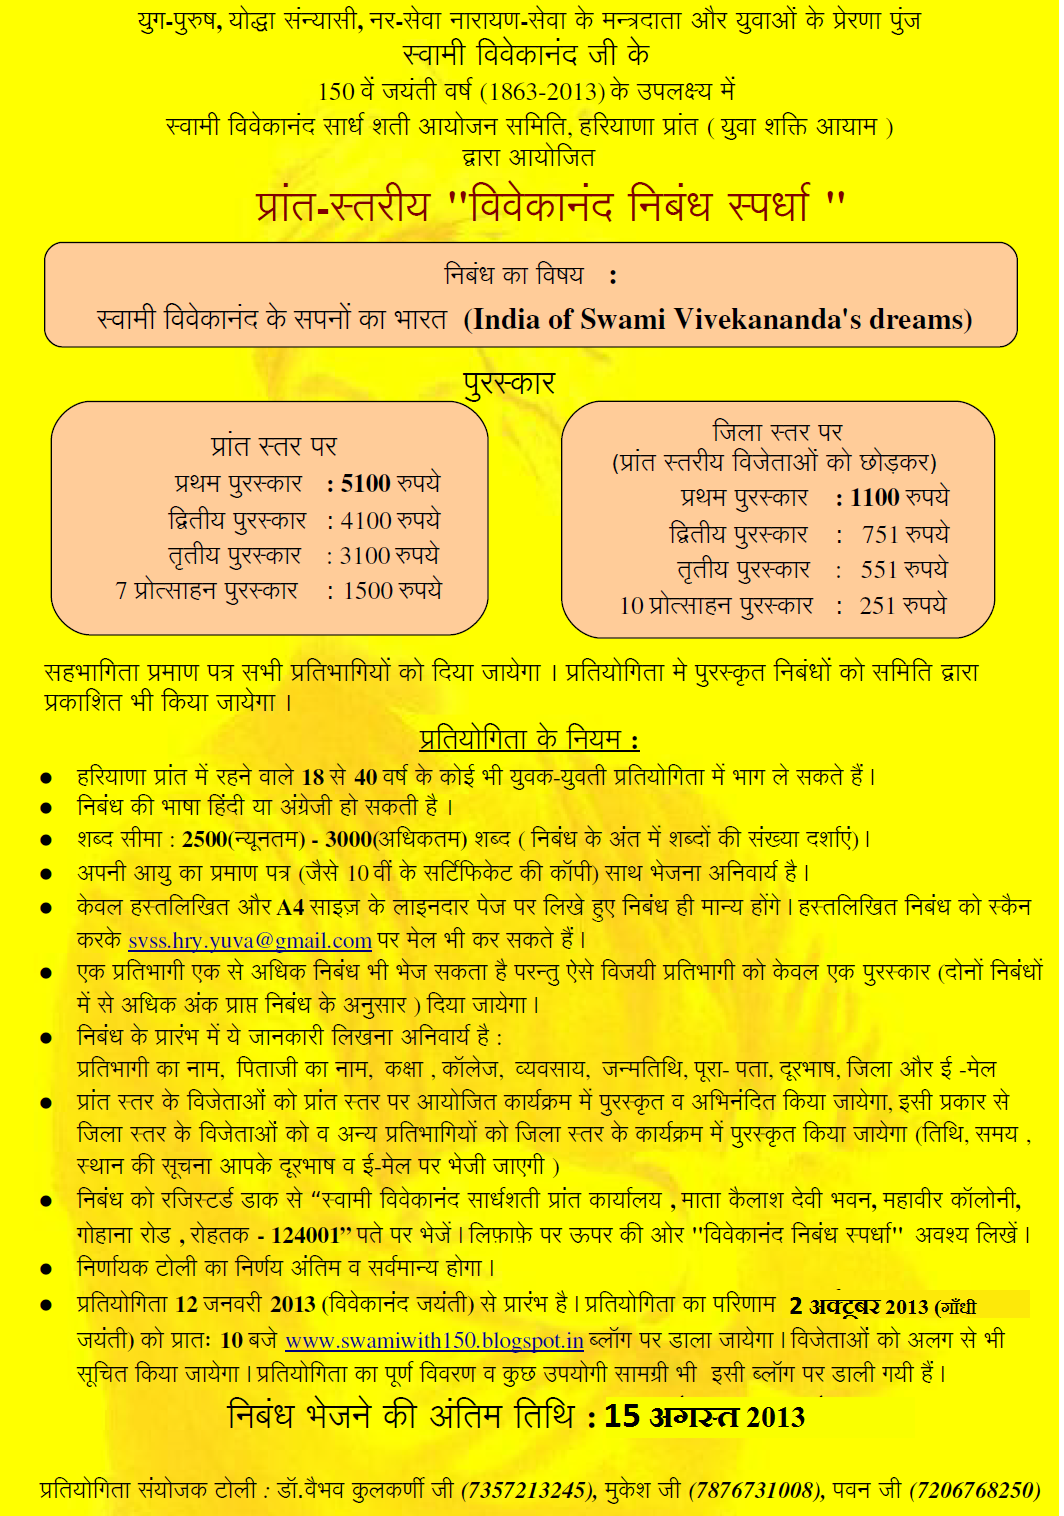 swami vivekananda youth of praant stariya nibandh spardha praant stariya nibandh spardha